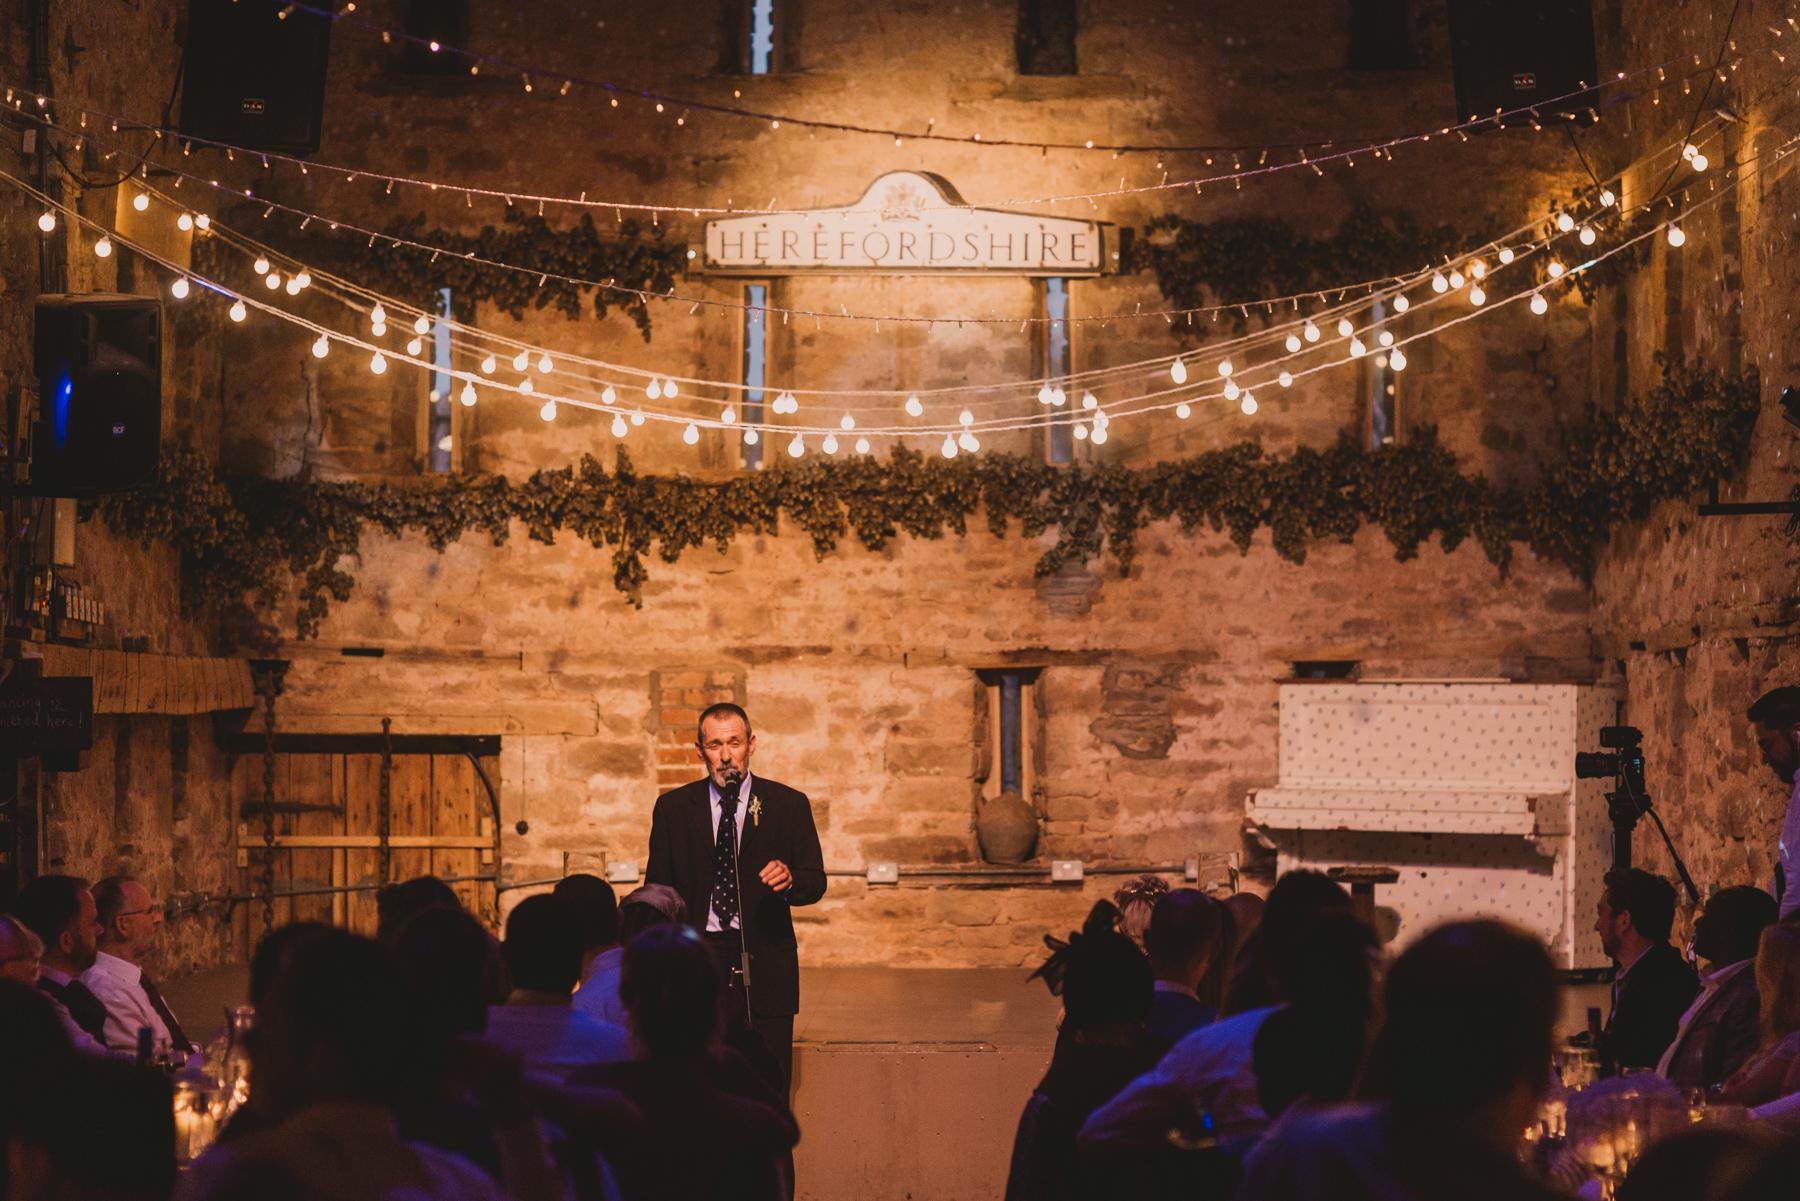 Herefordshire-barn-wedding-highlights-120.jpg